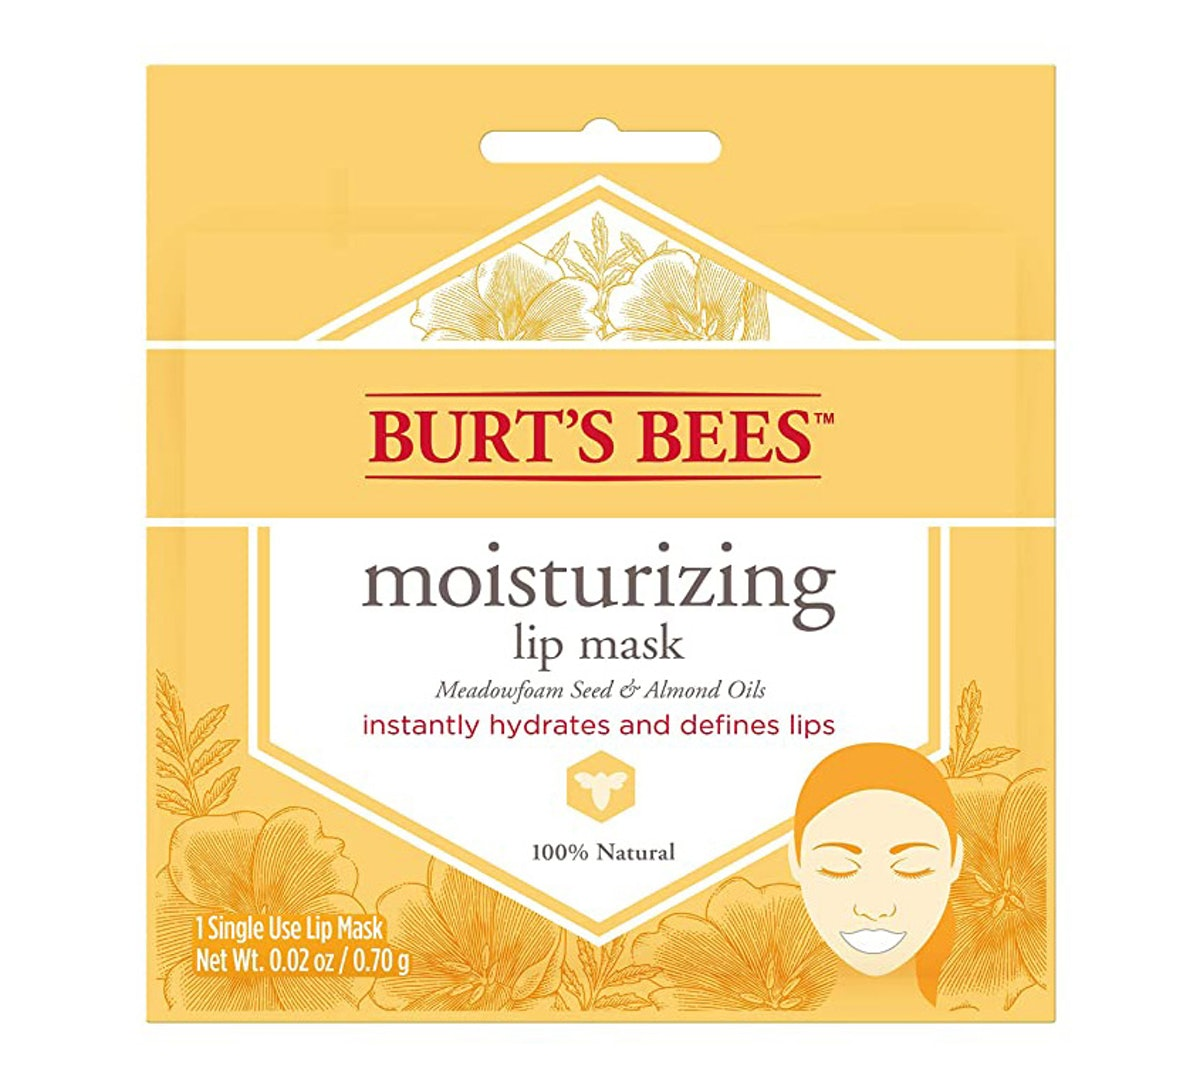 Burt's Bees Moisturizing Lip Mask (6-Pack)